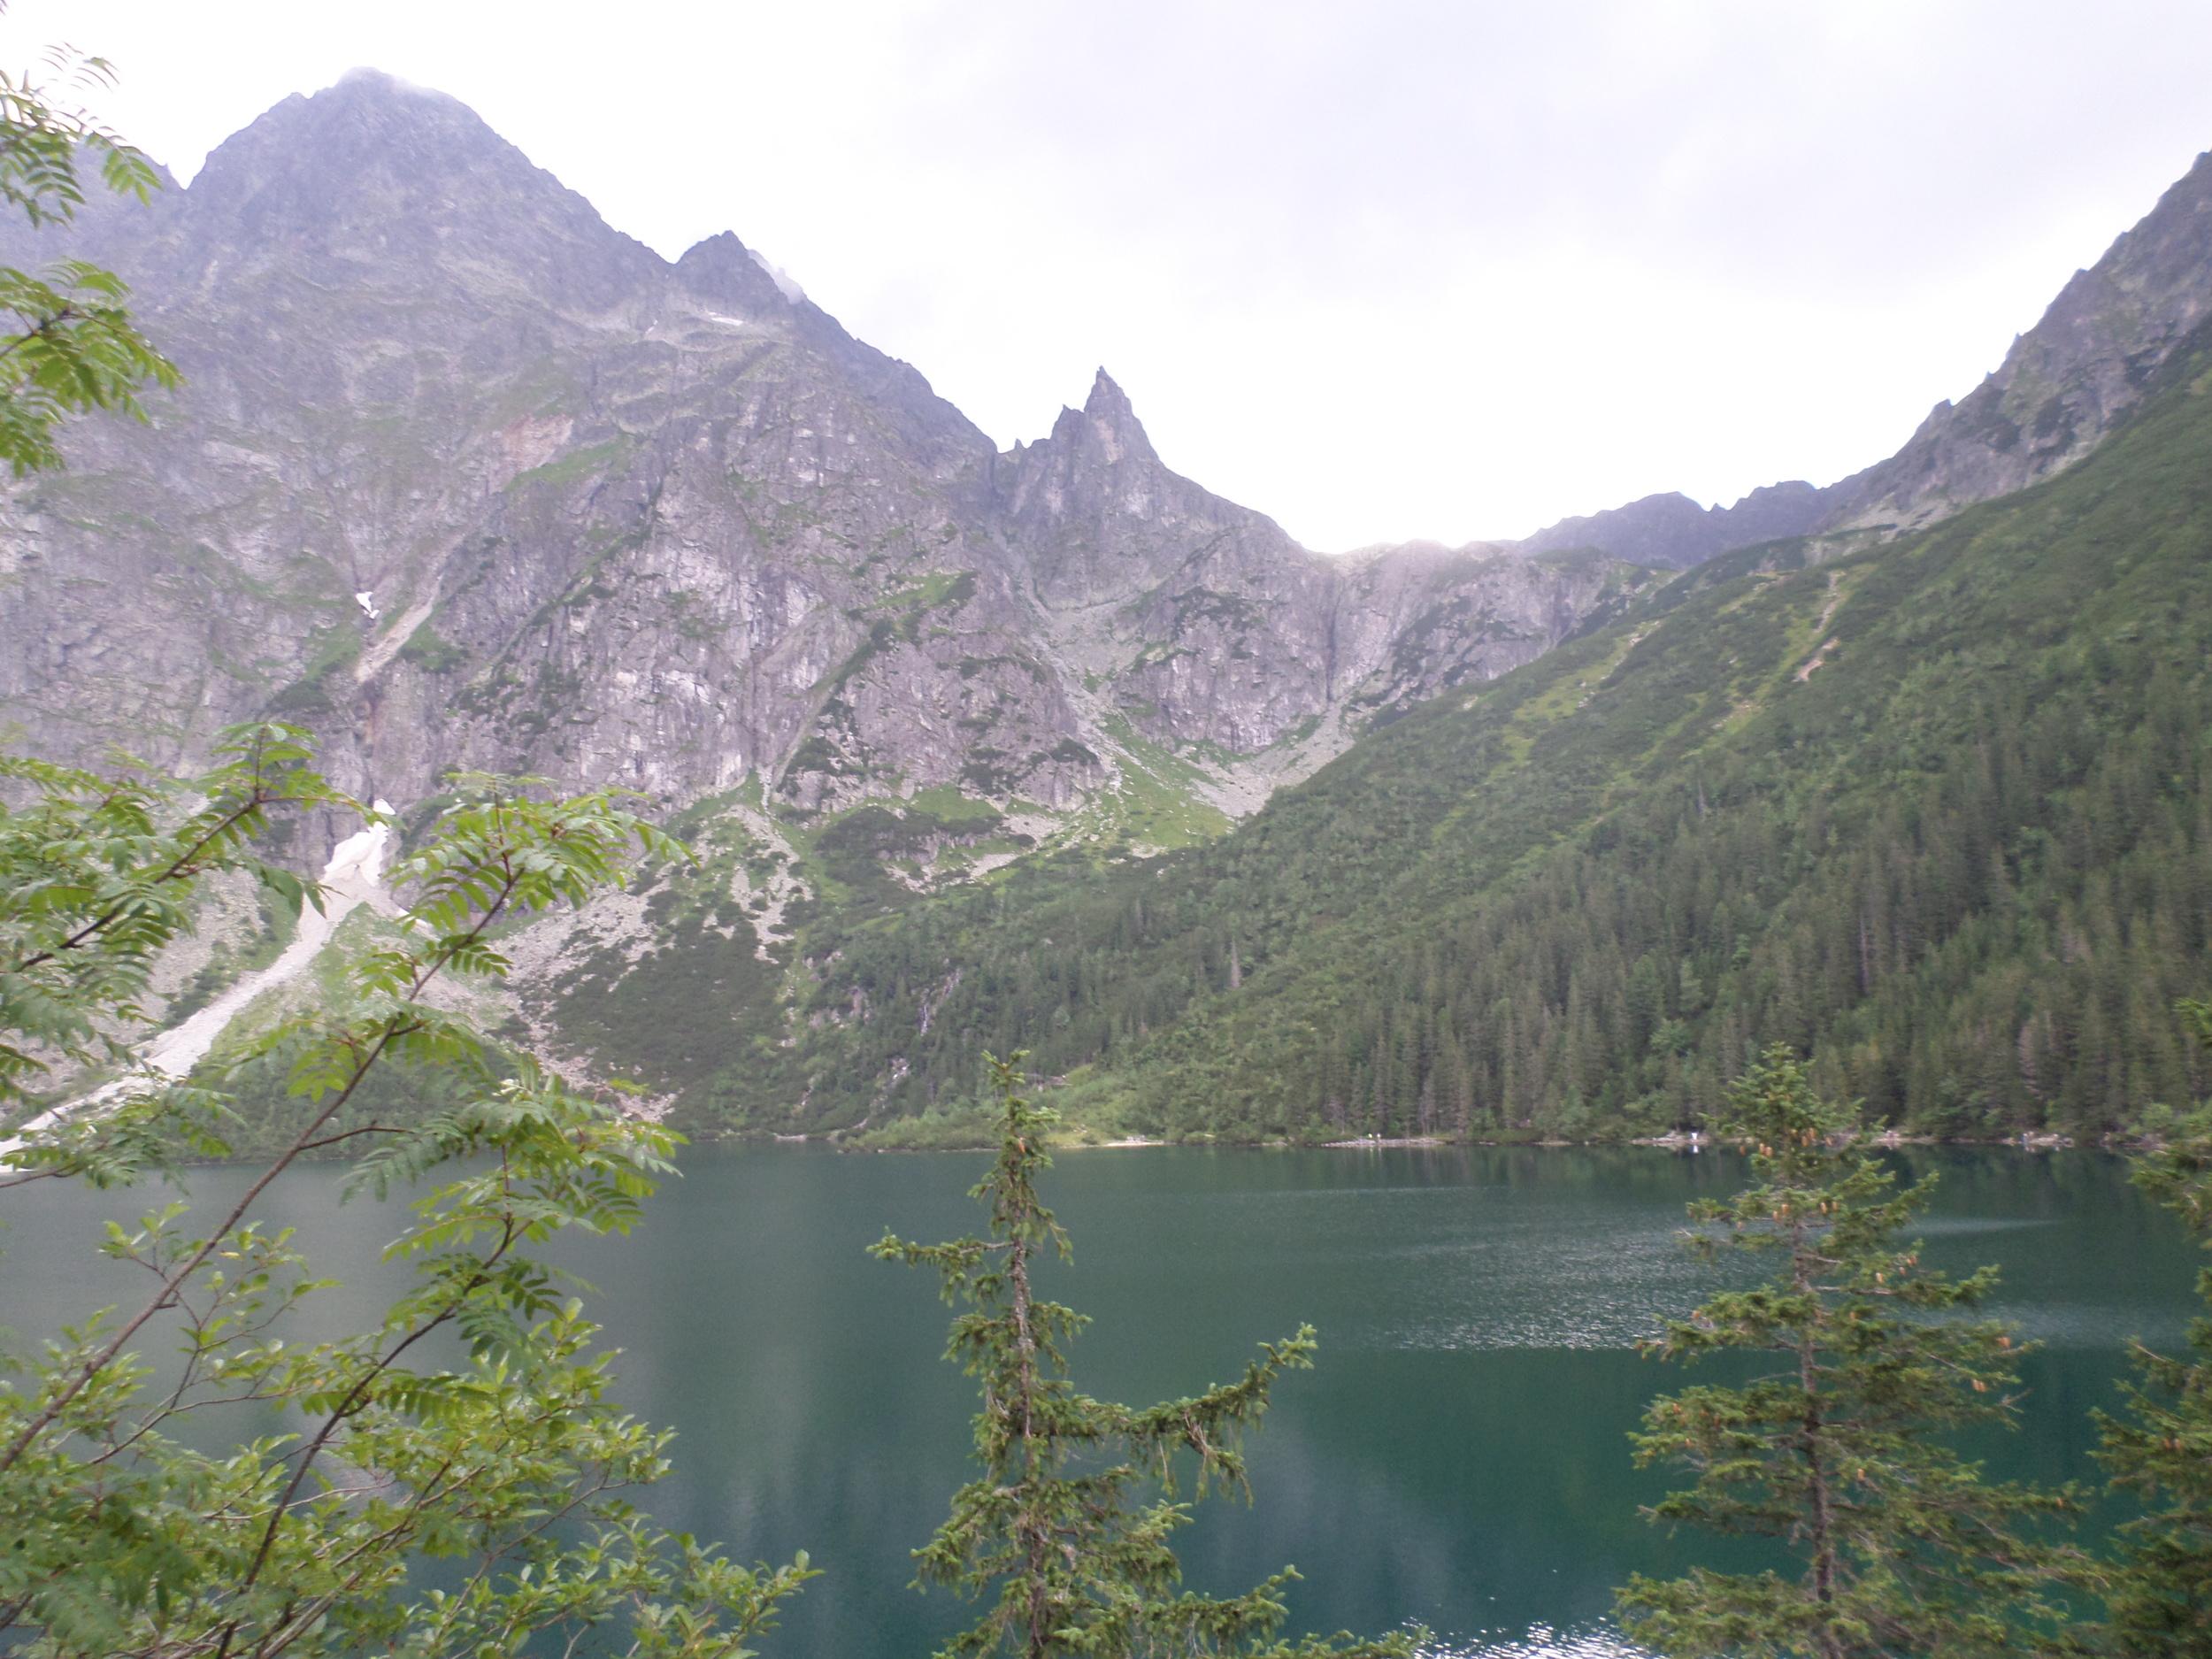 Lake at Zakopane, Poland